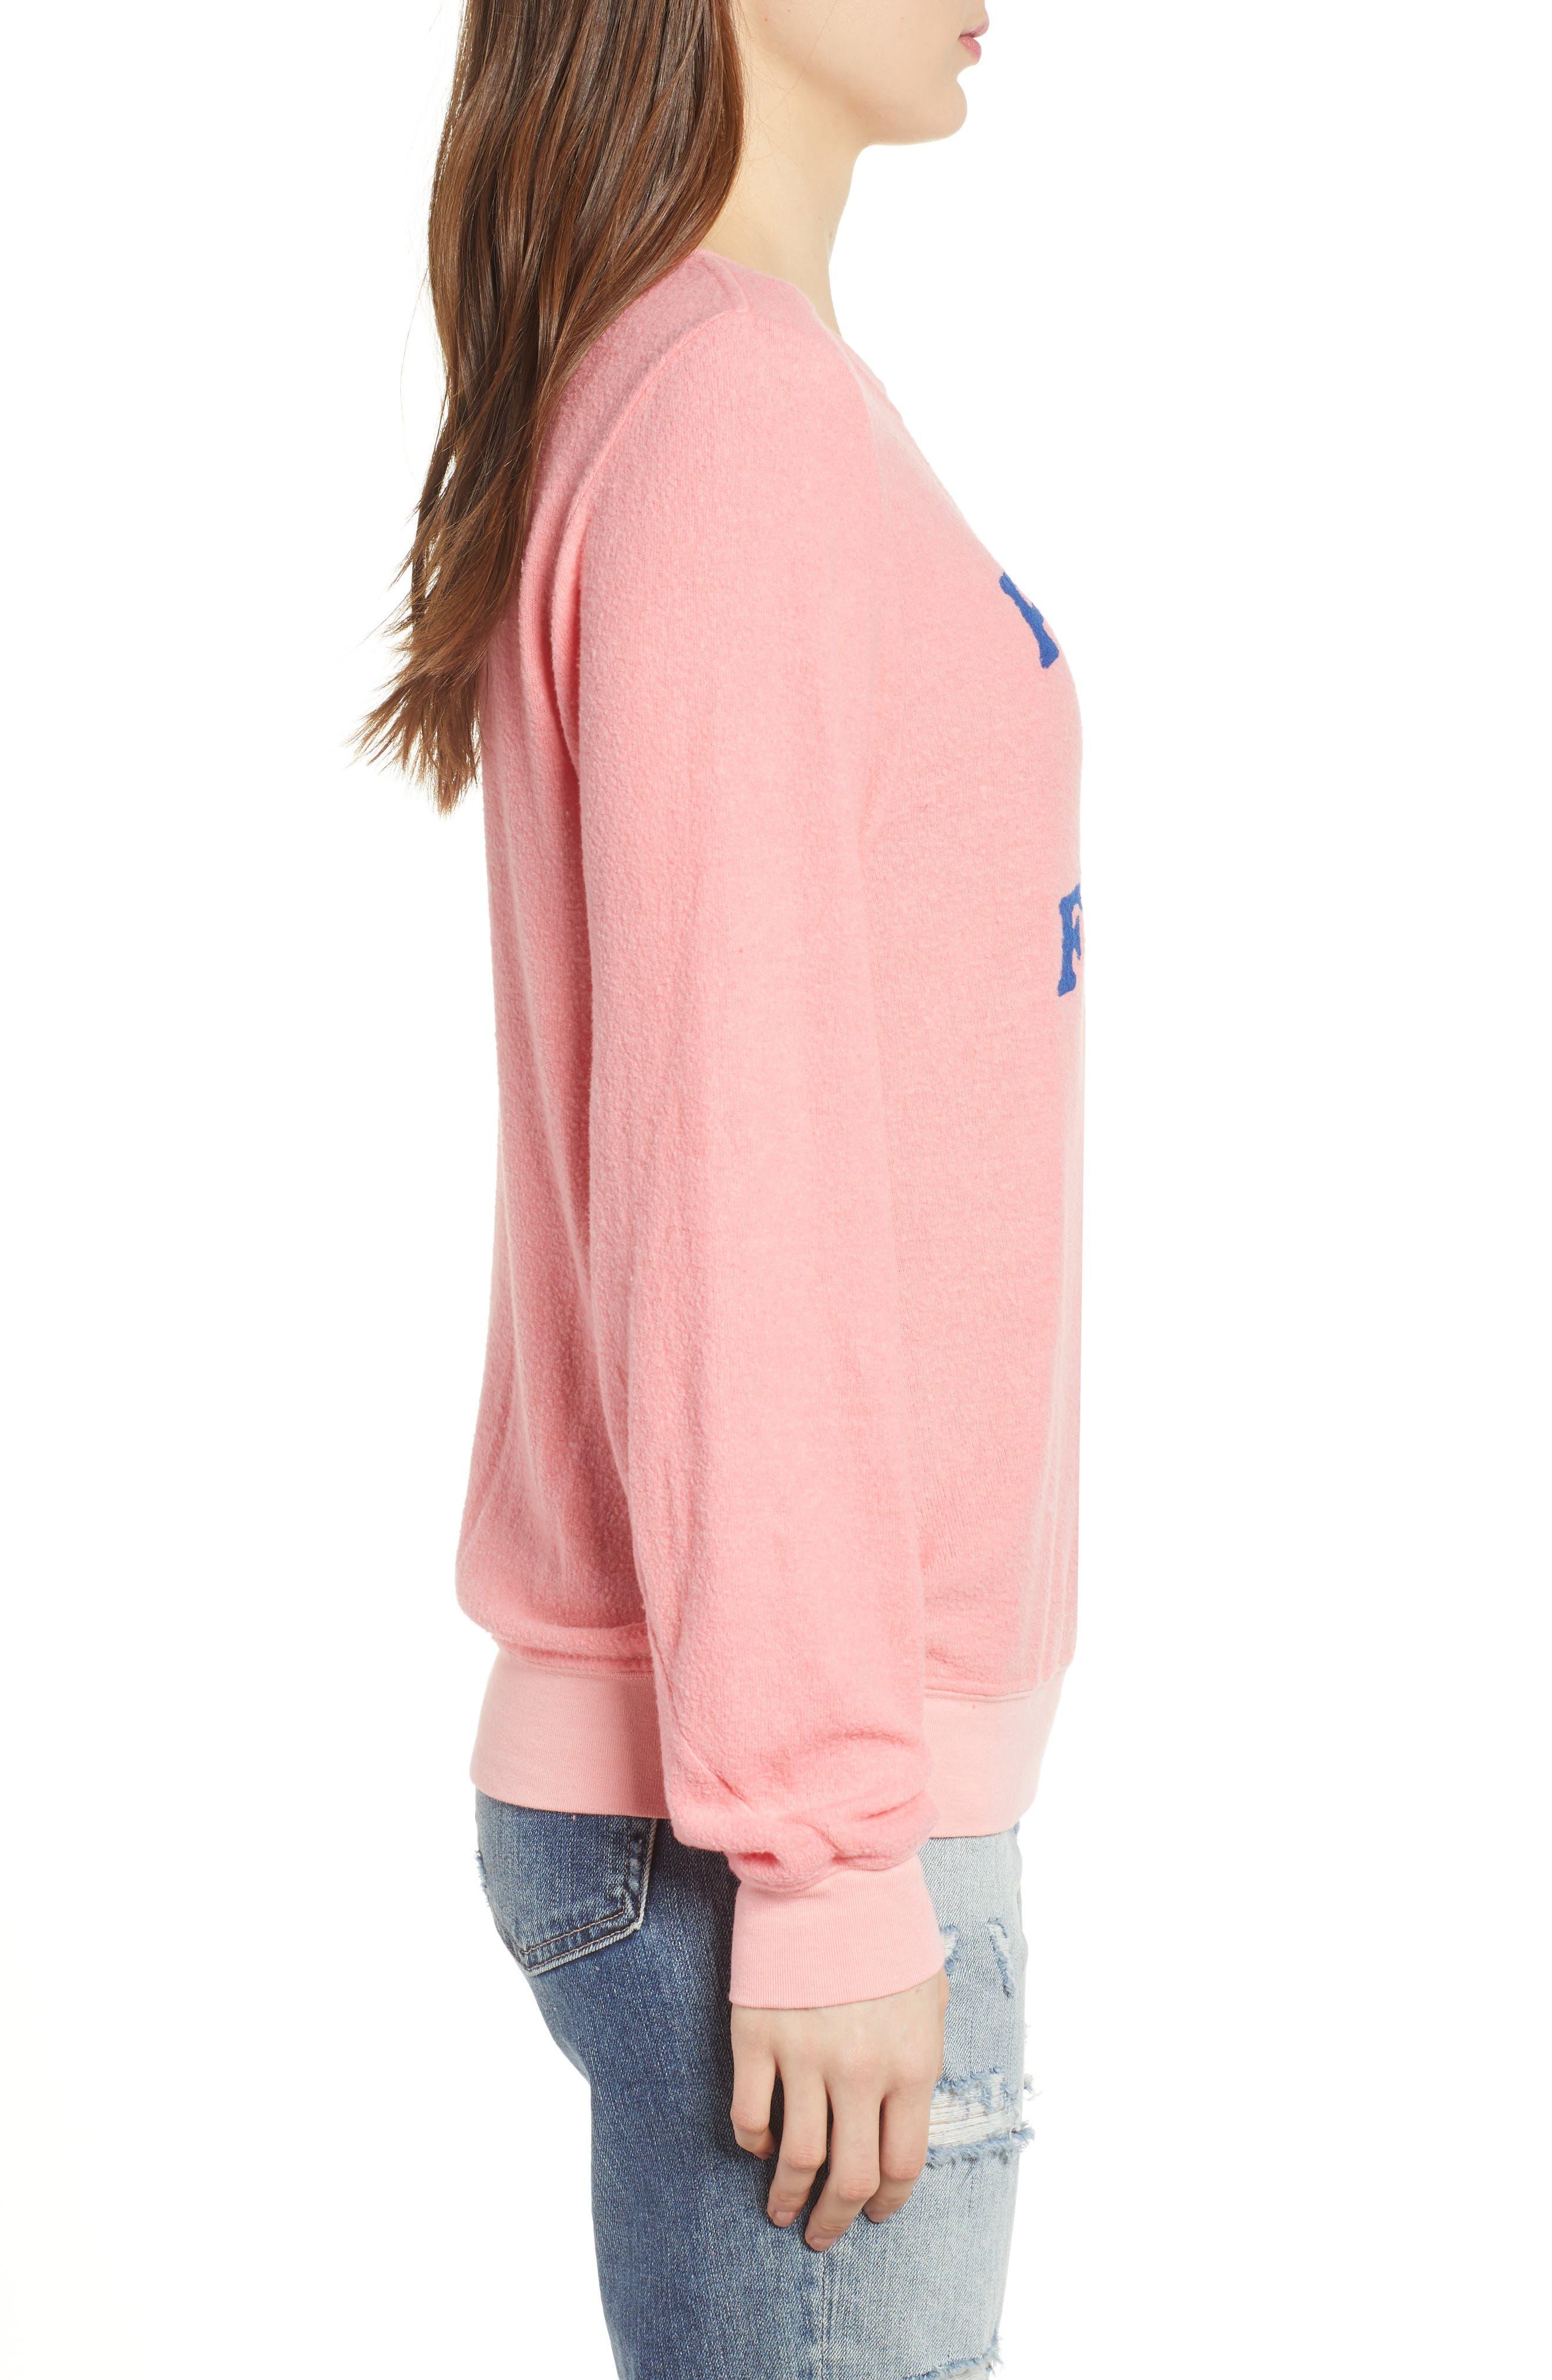 Pardon My French Sweatshirt,                             Alternate thumbnail 3, color,                             950